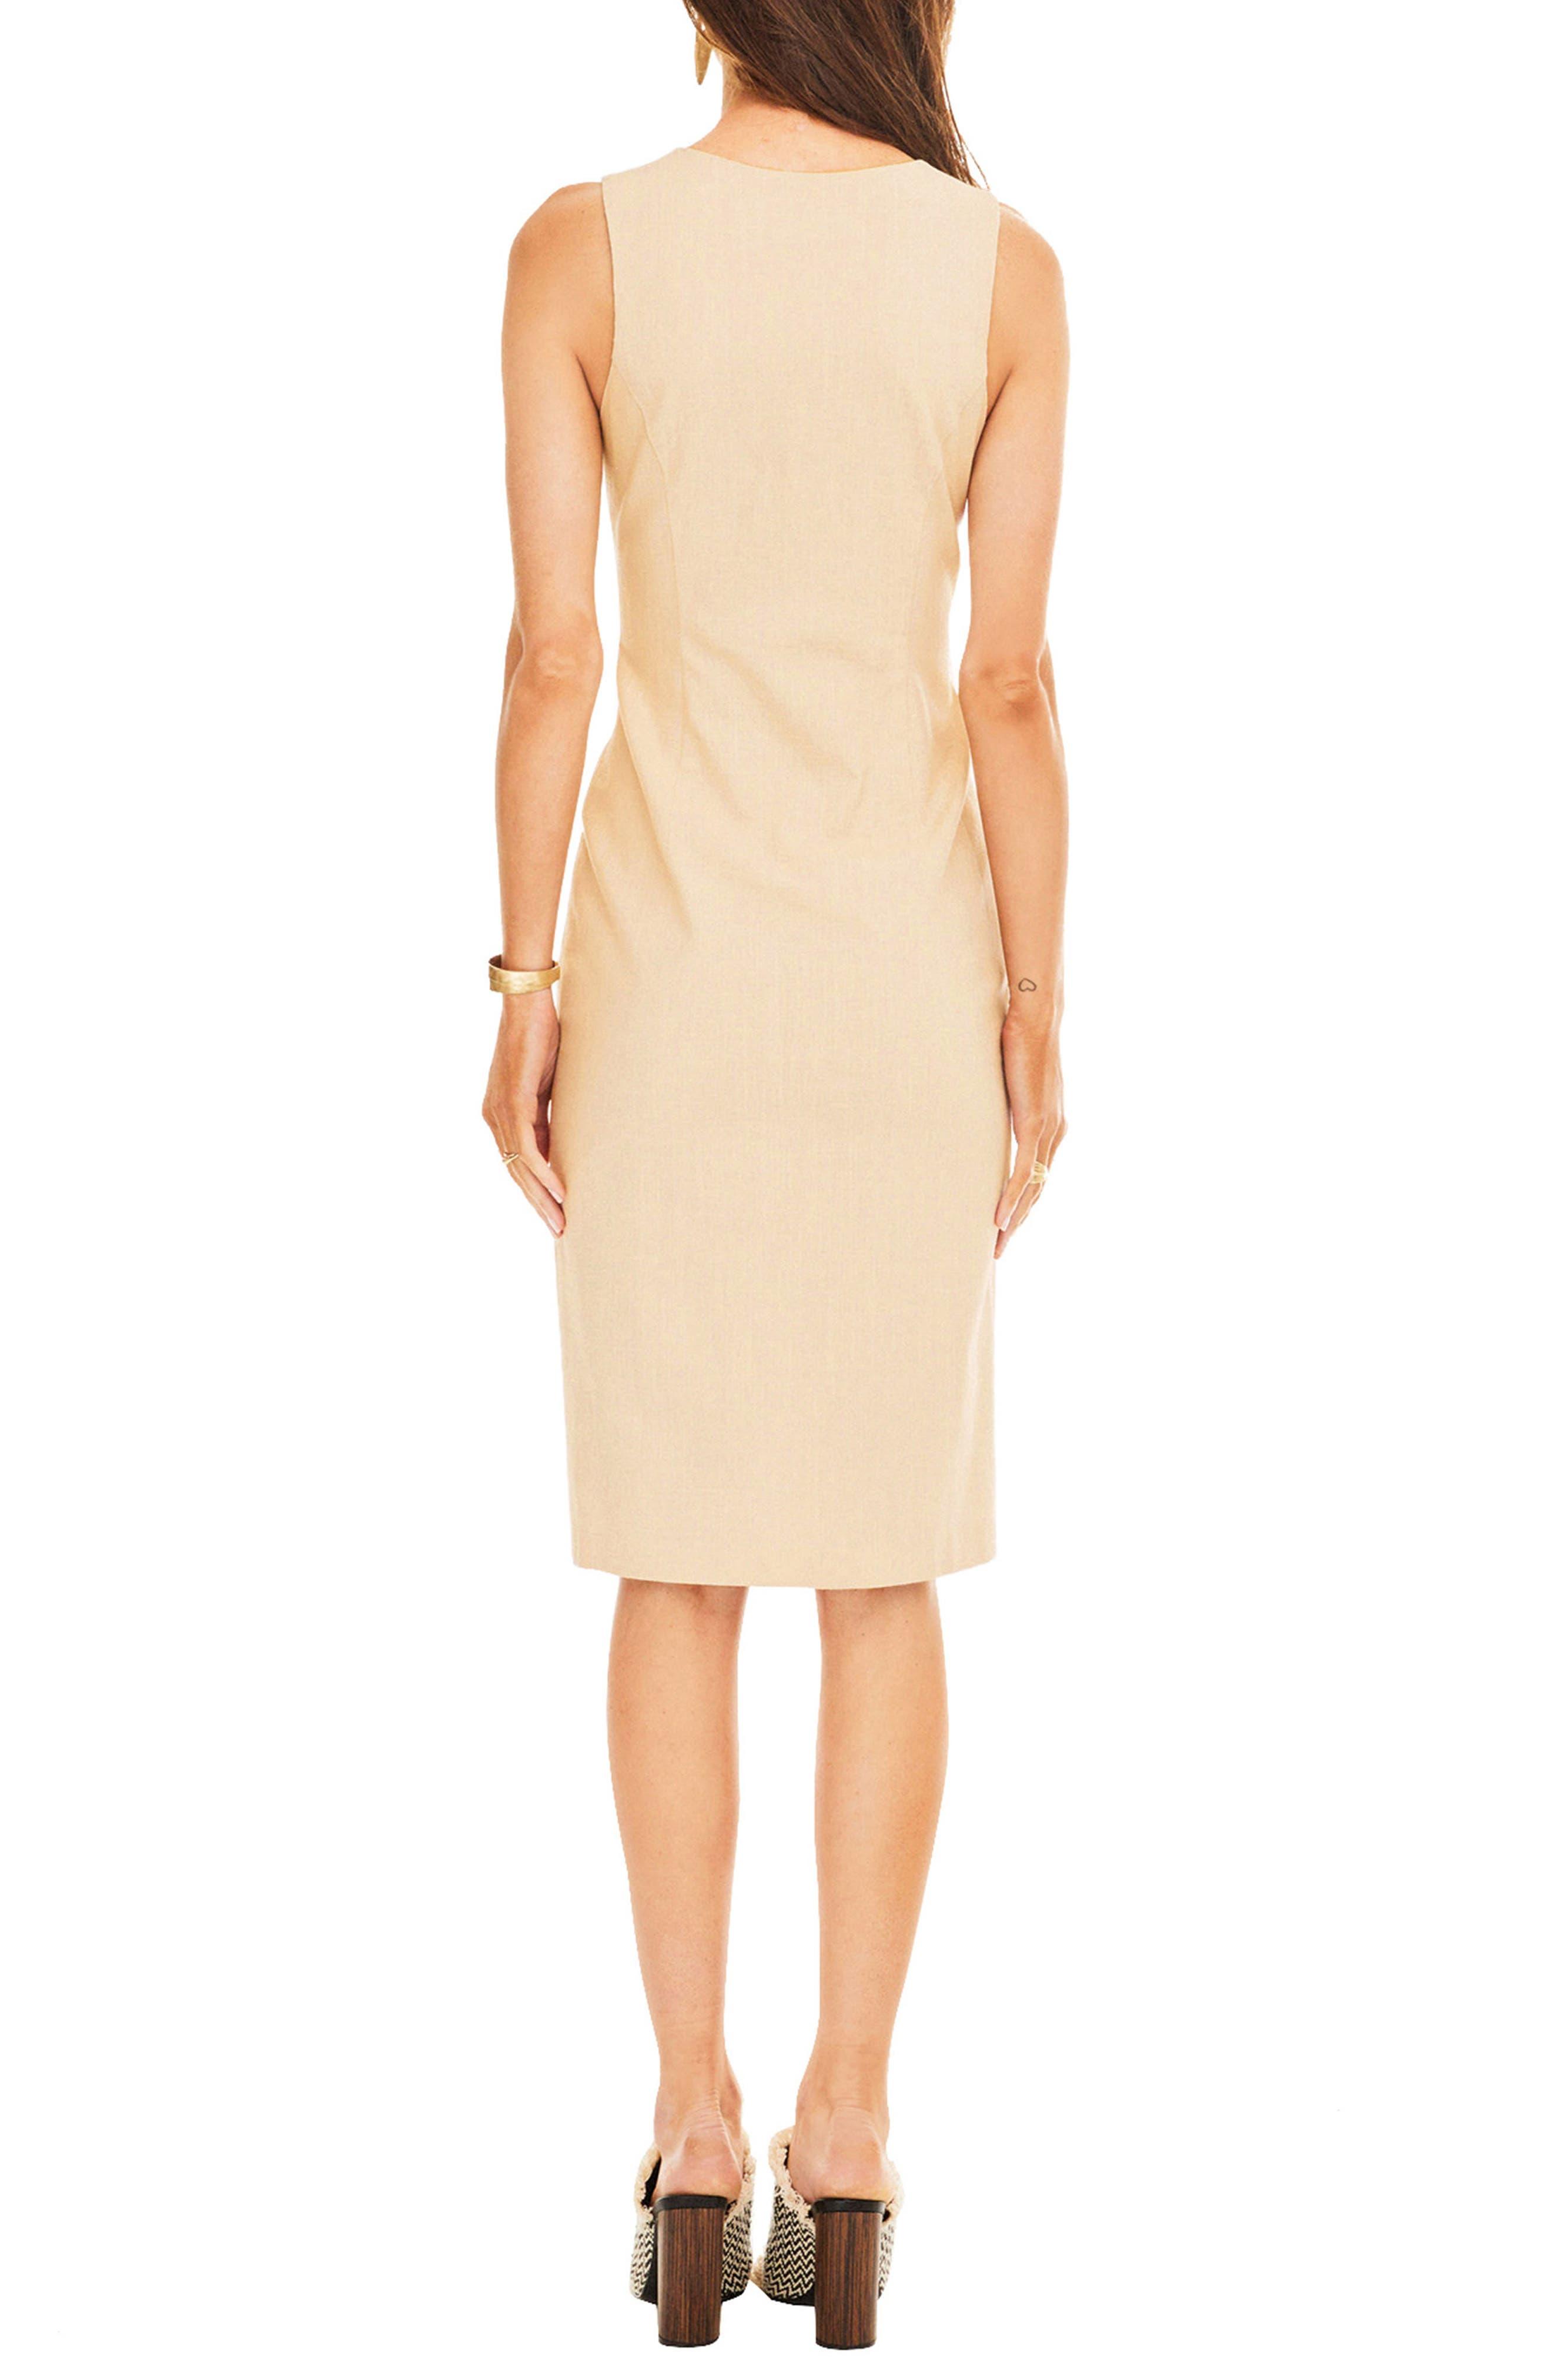 ASTR THE LABEL,                             Demi Dress,                             Alternate thumbnail 2, color,                             250